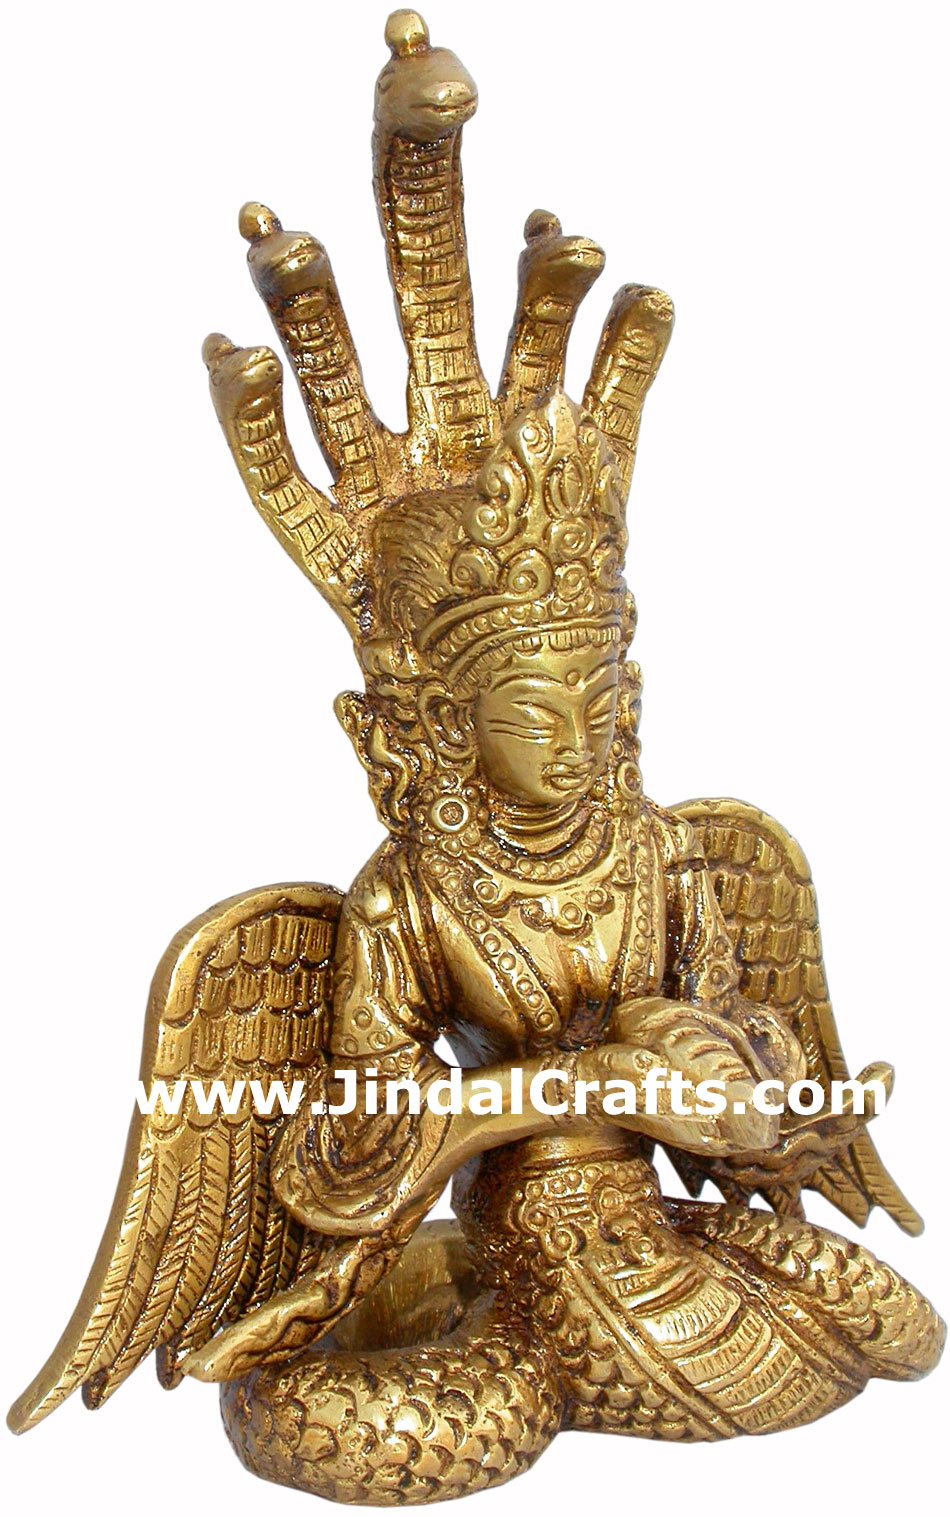 Mermaid Hand Carved Indian Art Craft Handicraft Home Decor Brass Figurine